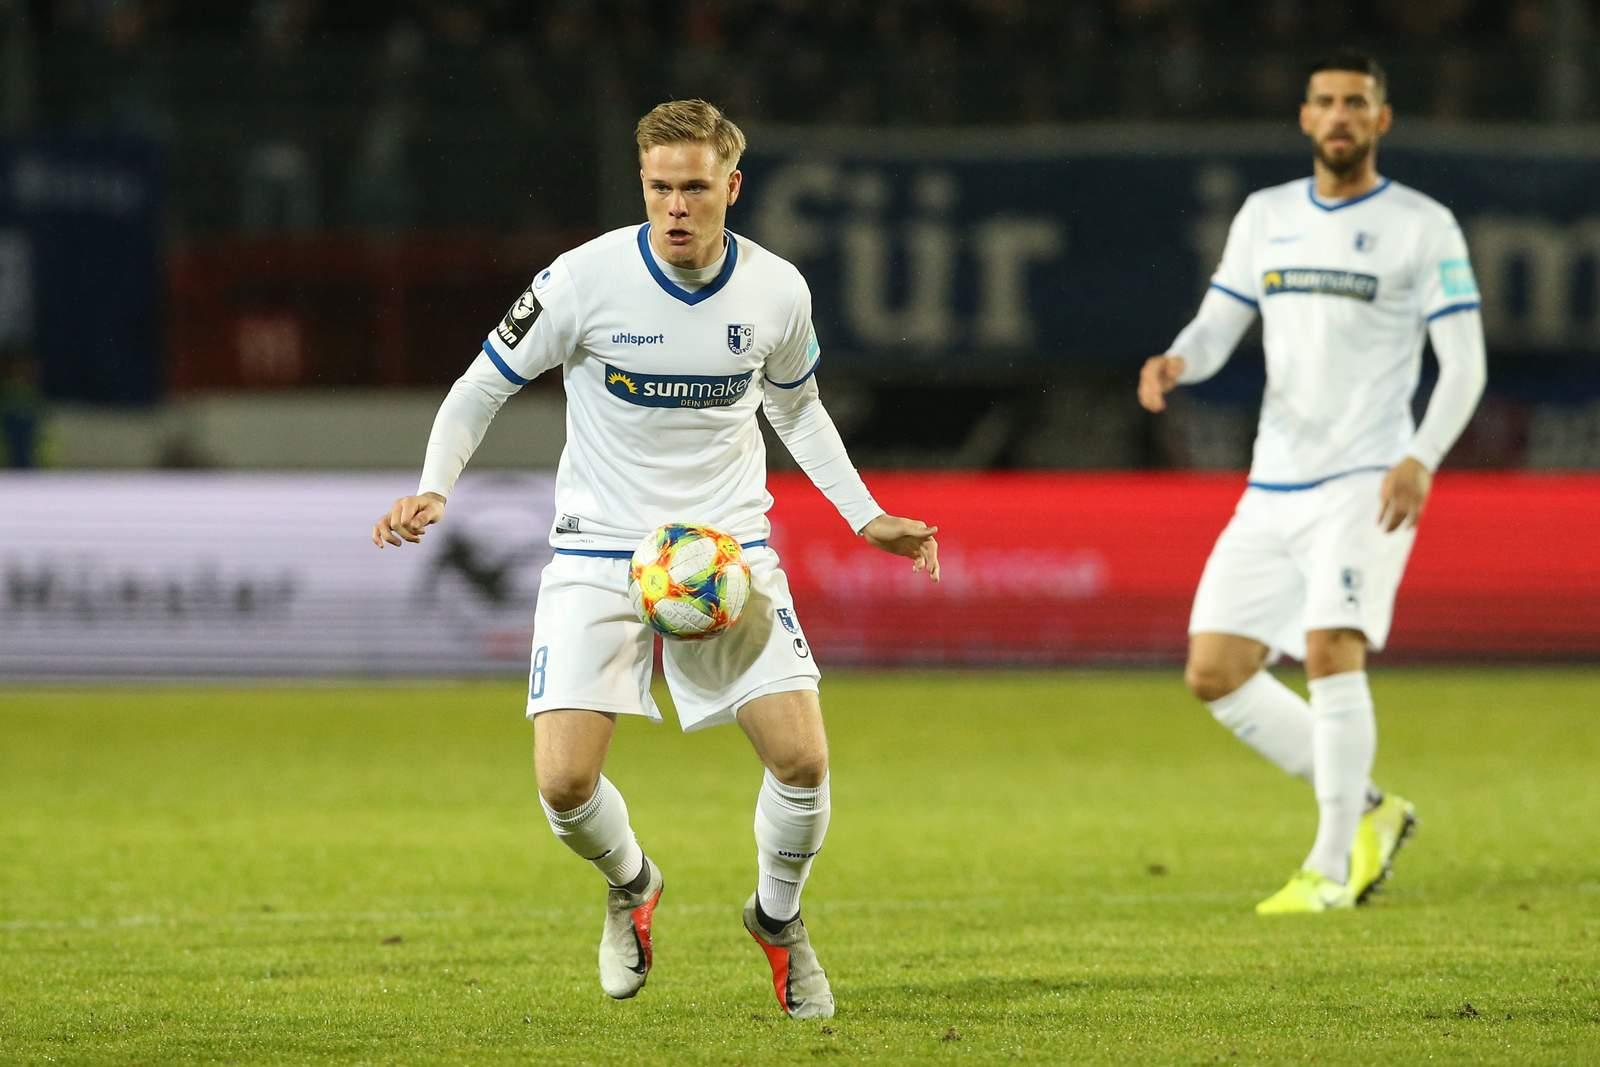 Thorne Jacobsen beim 1. FC Magdeburg